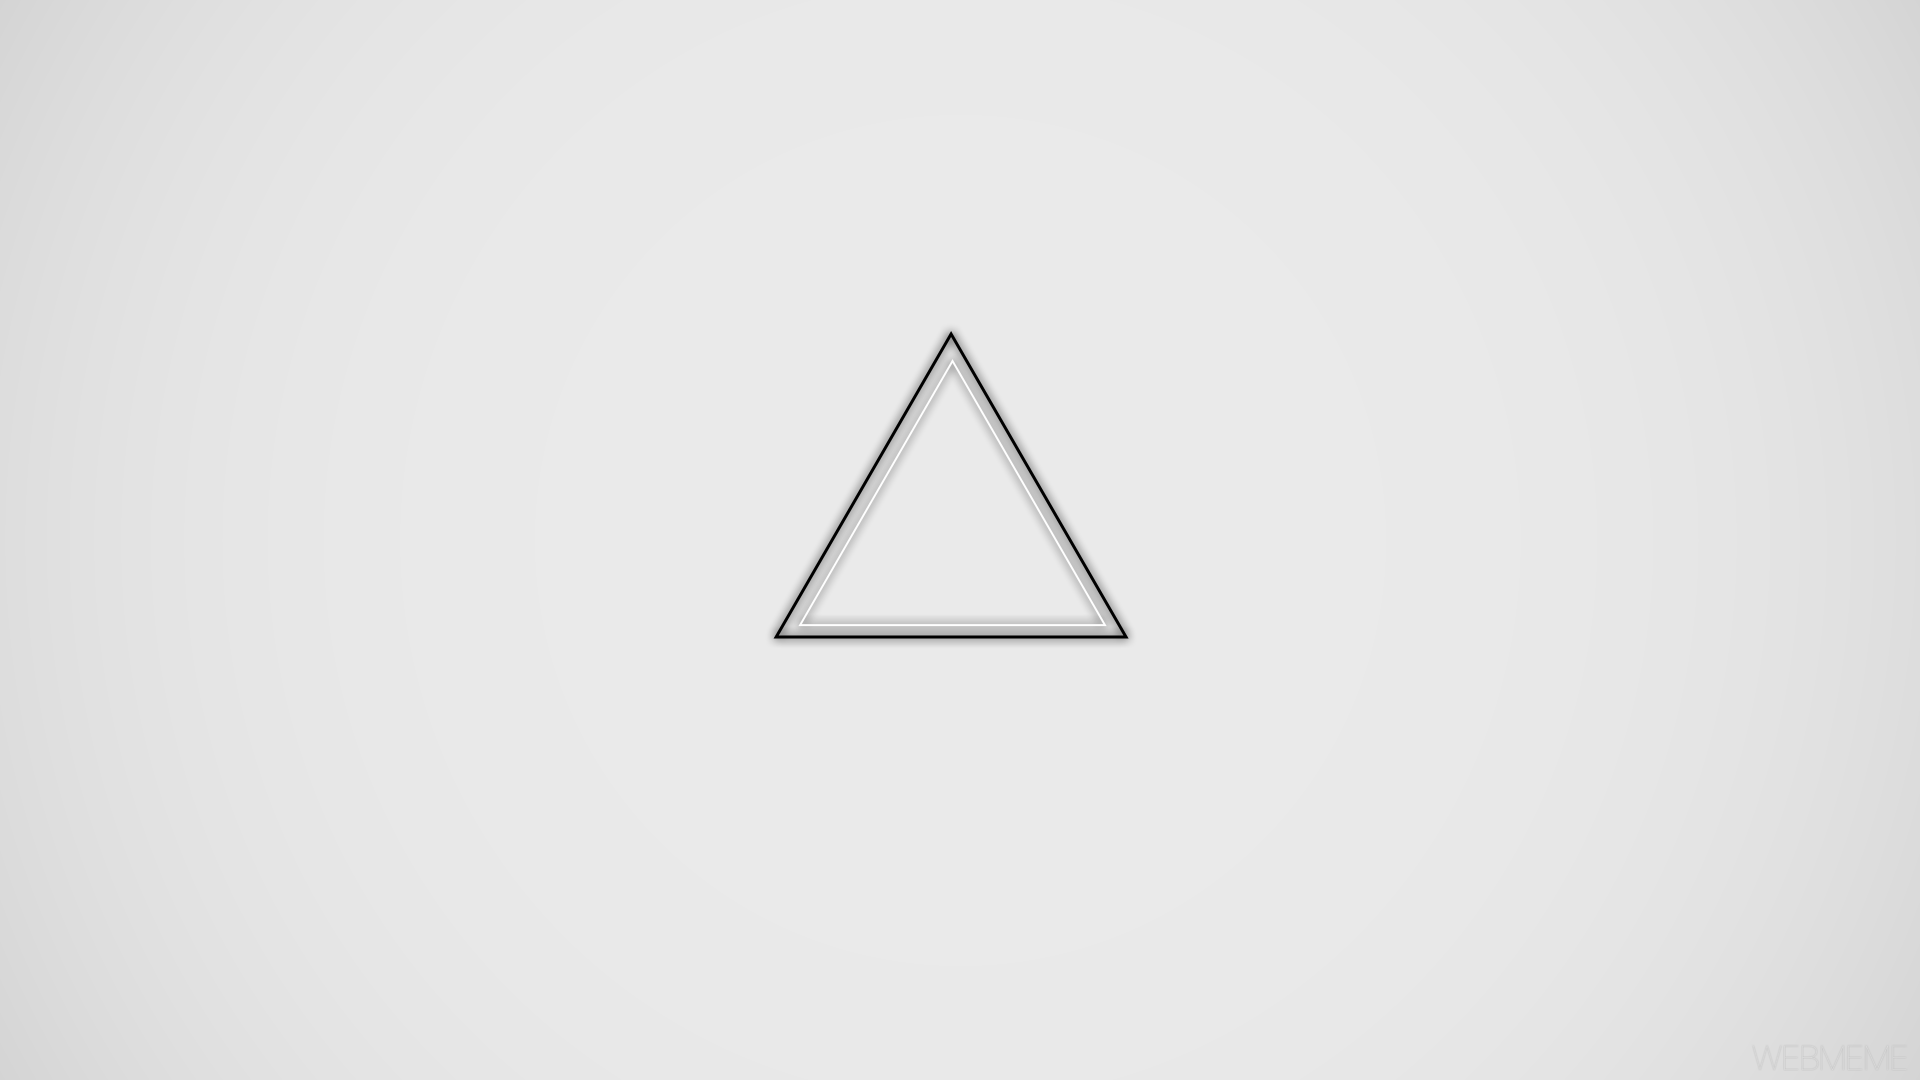 General X Minimalism Geometry Triangle Black White